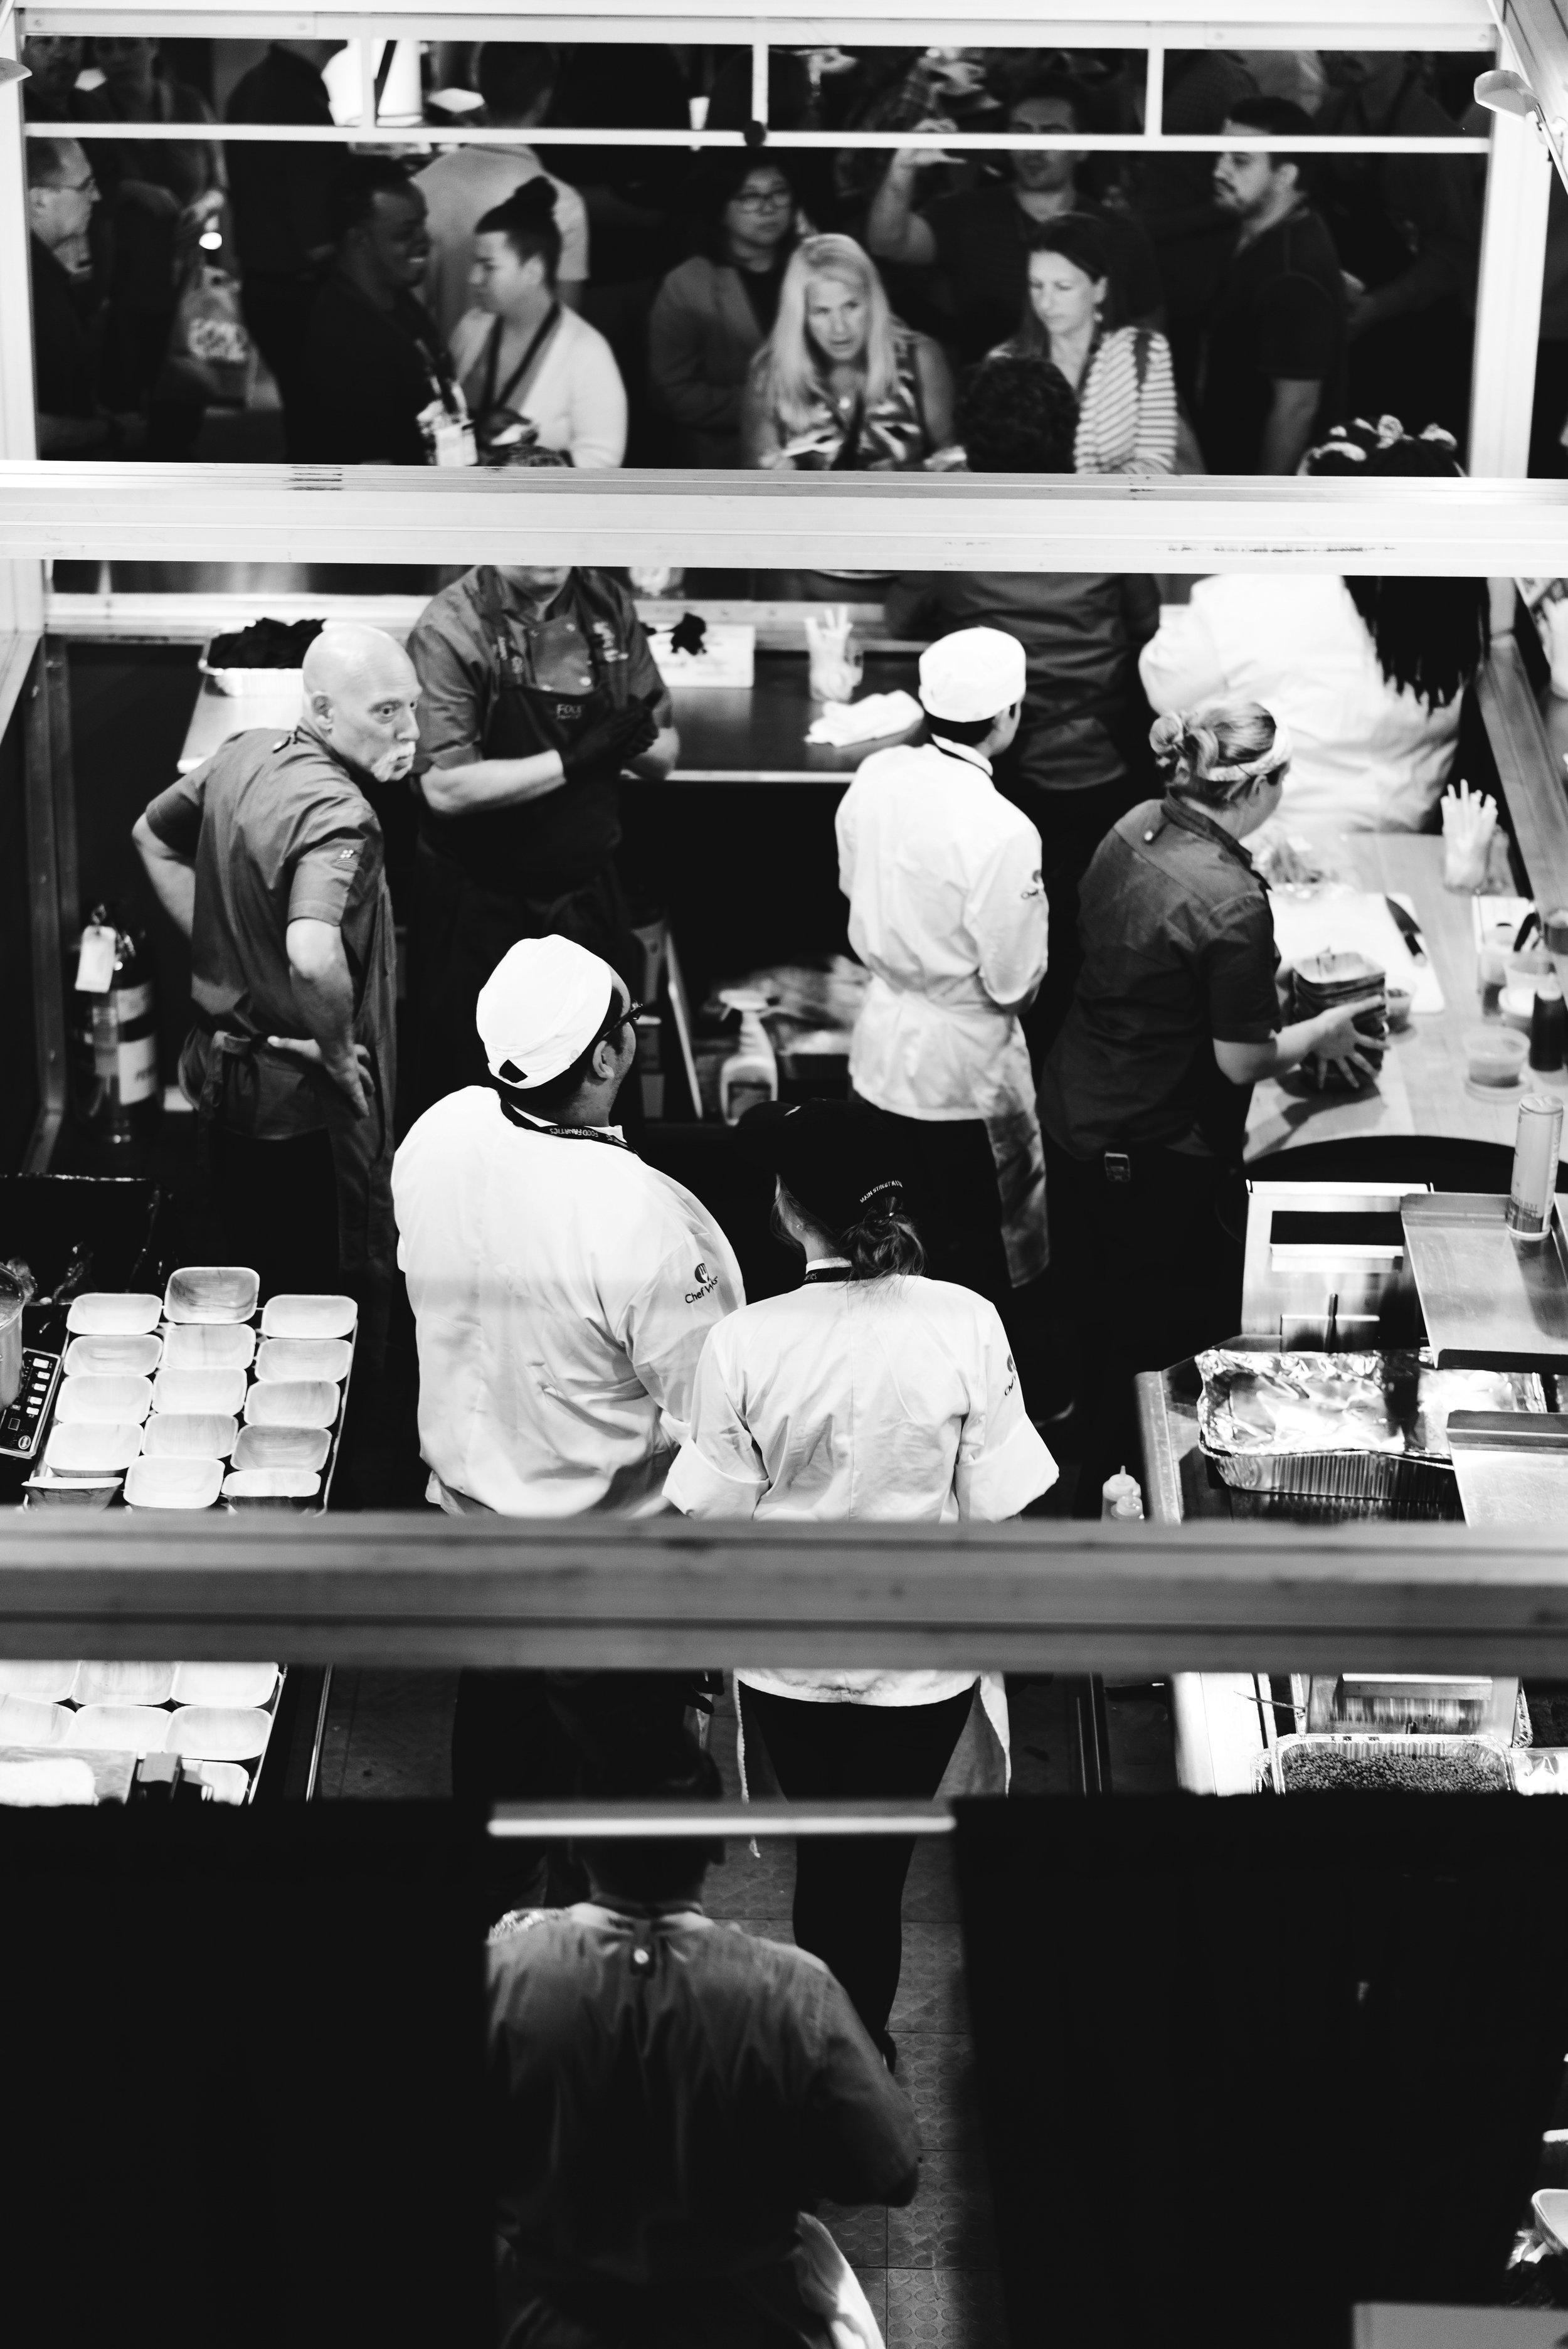 FoodFanaticsLive-Event-Food-Photography036.jpg